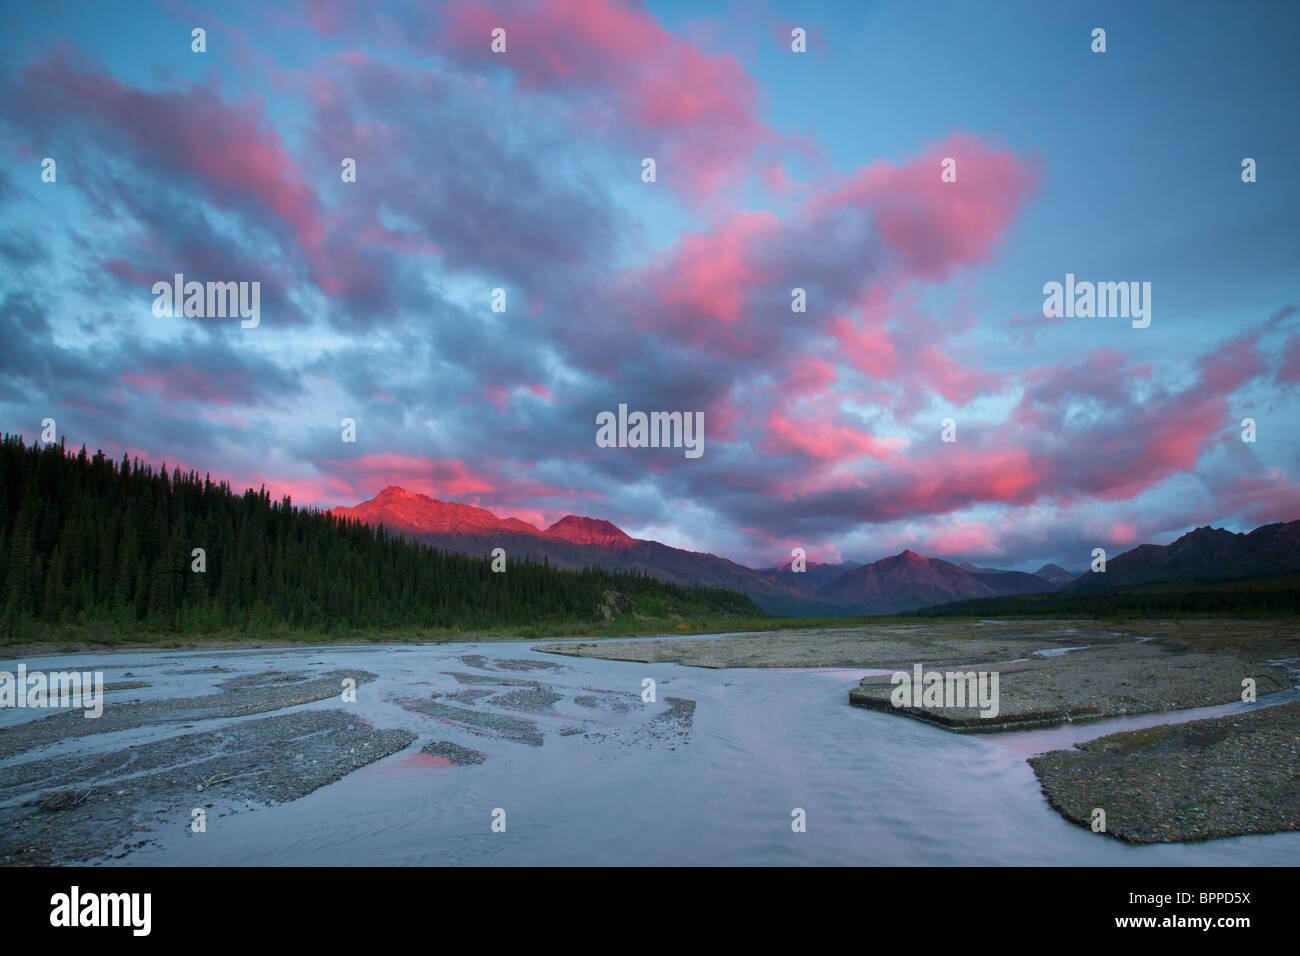 Sunset over the Teklanika River valley, Denali National Park, Alaska. - Stock Image